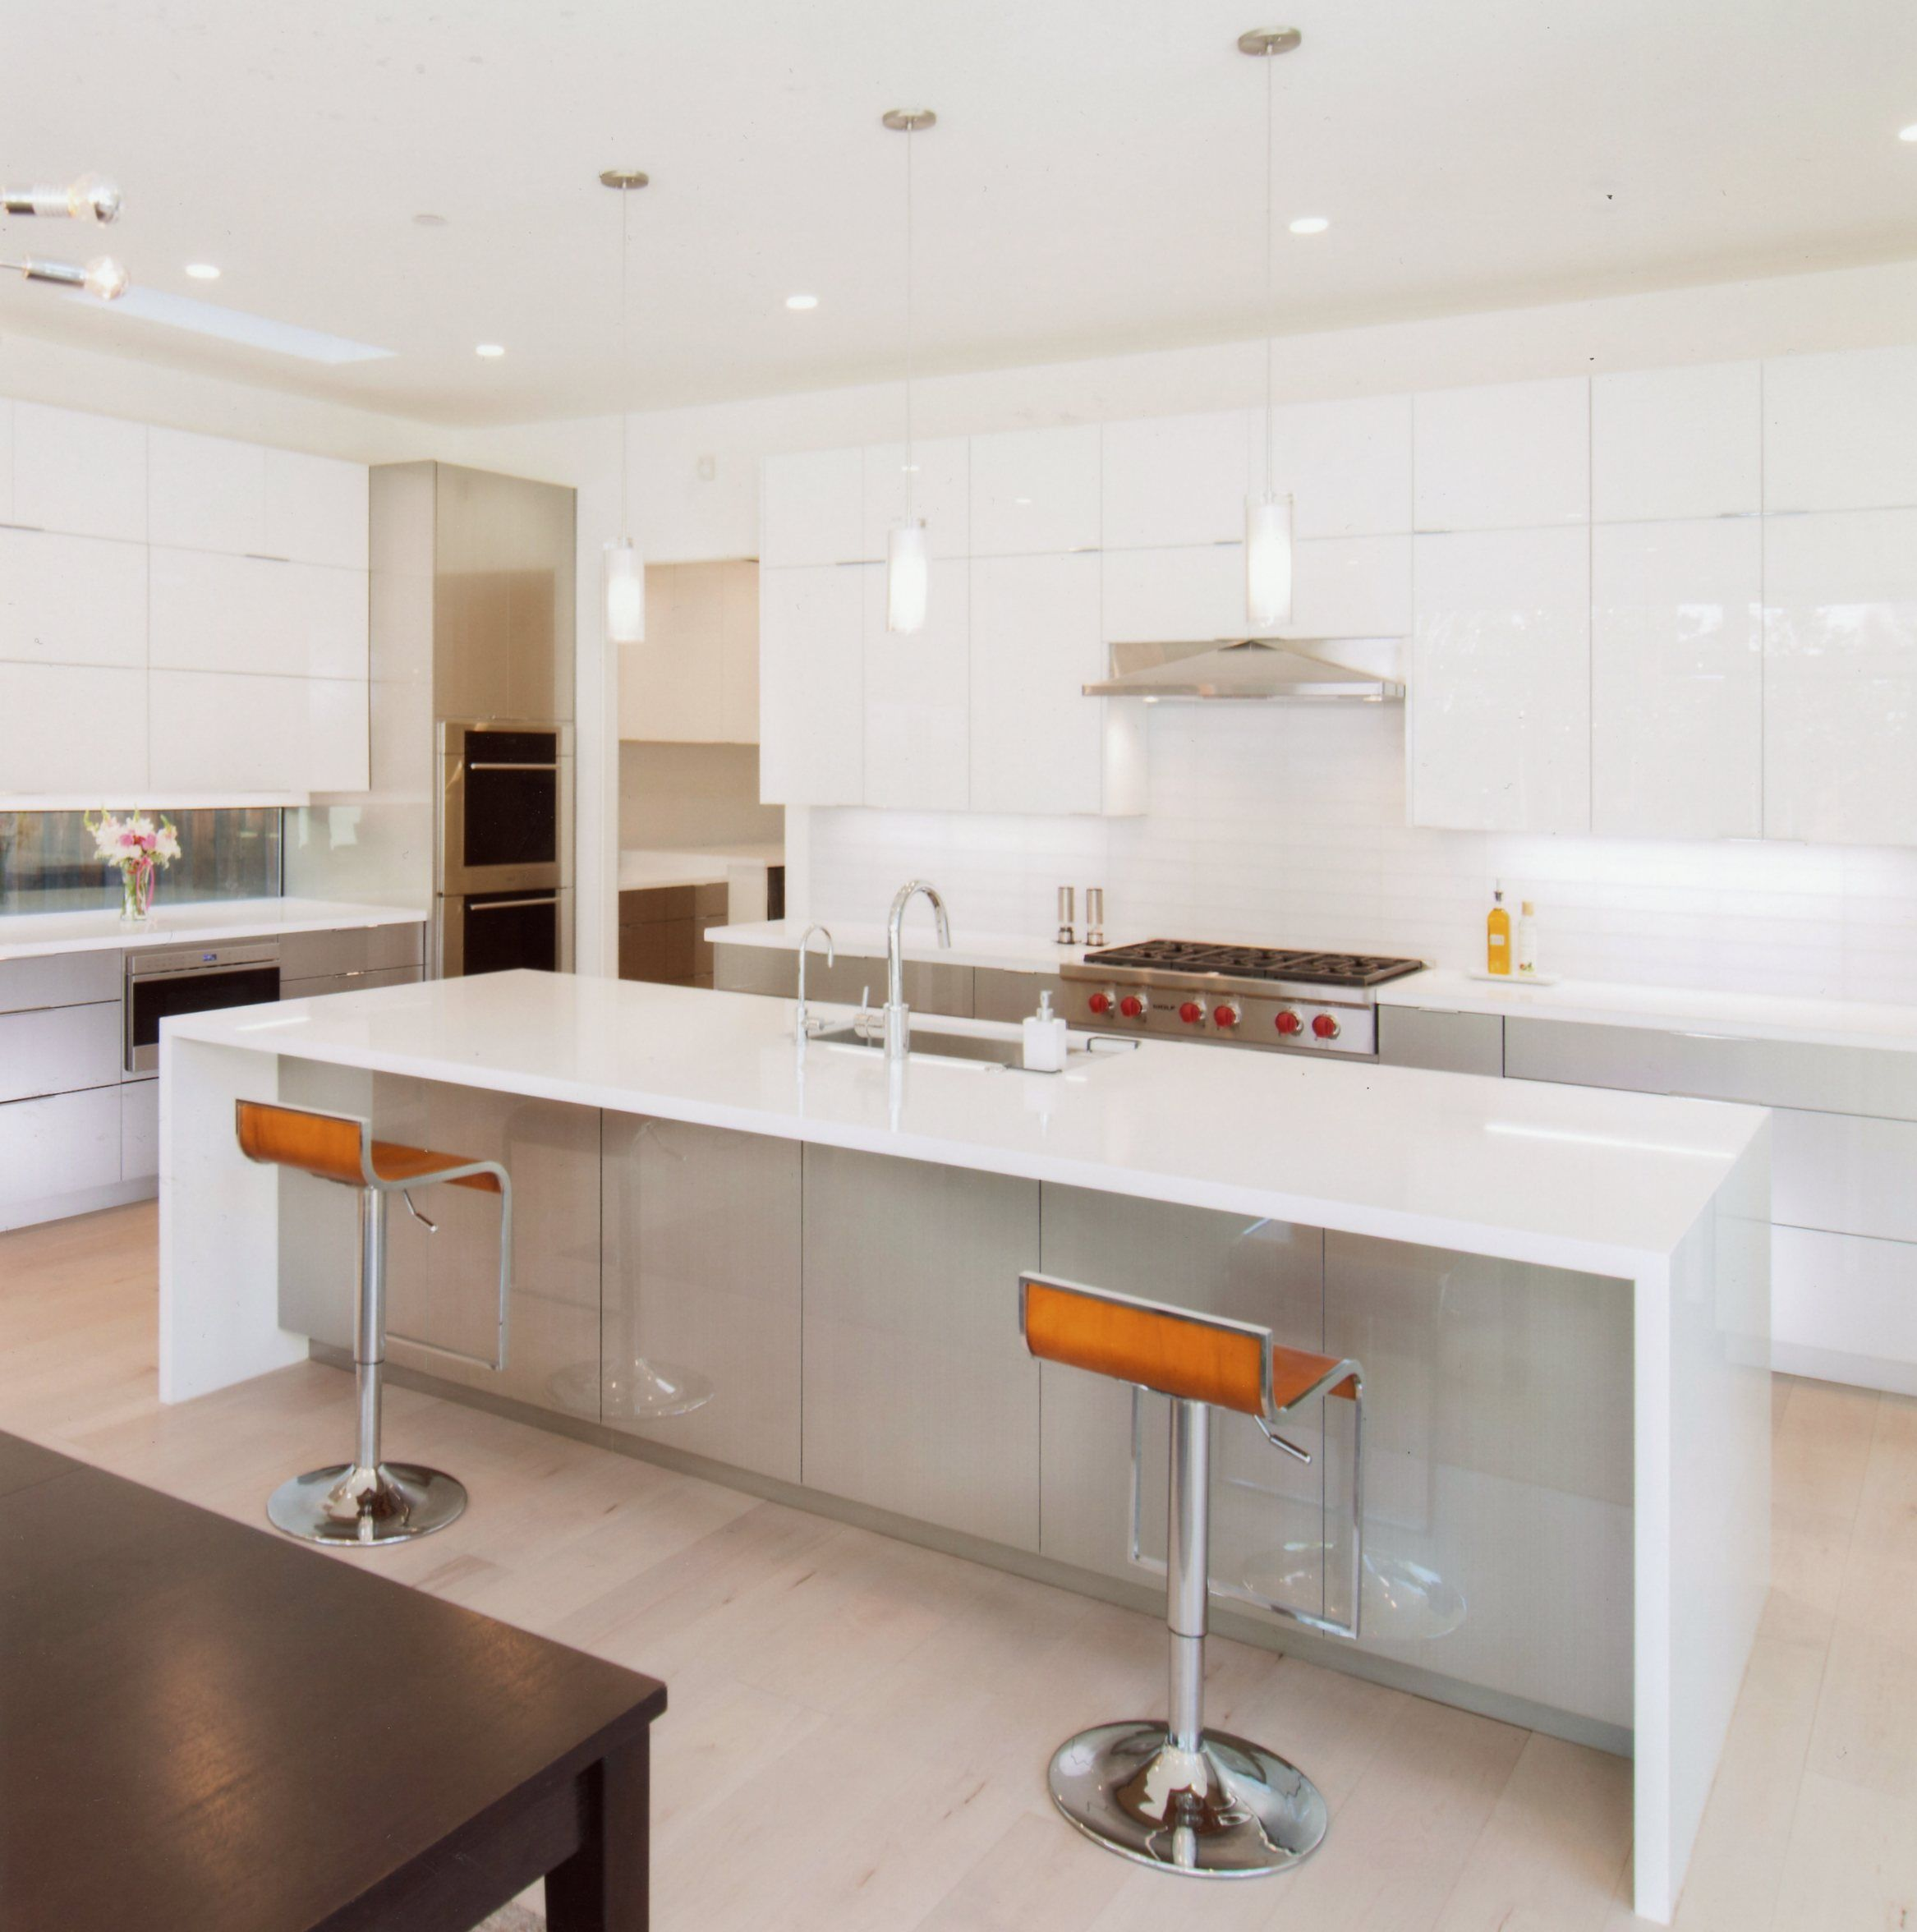 High Gloss Kitchen High Gloss Kitchen Kitchen Kitchen Construction